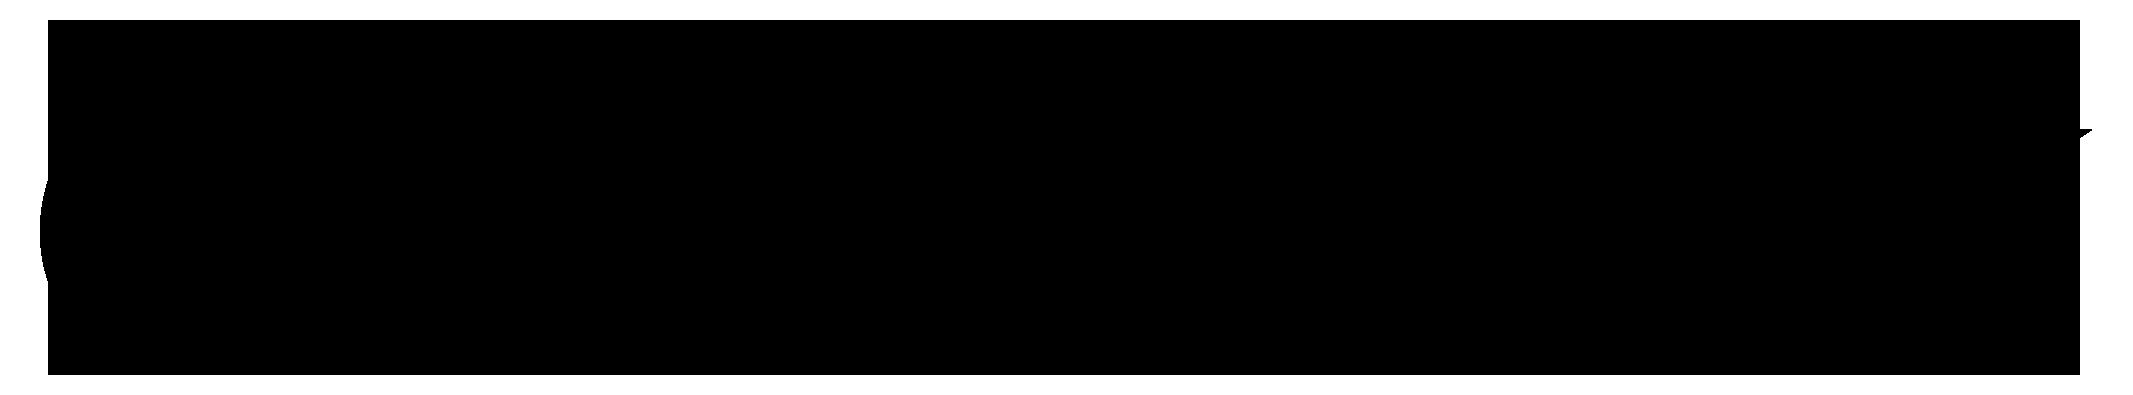 TT-logo_black